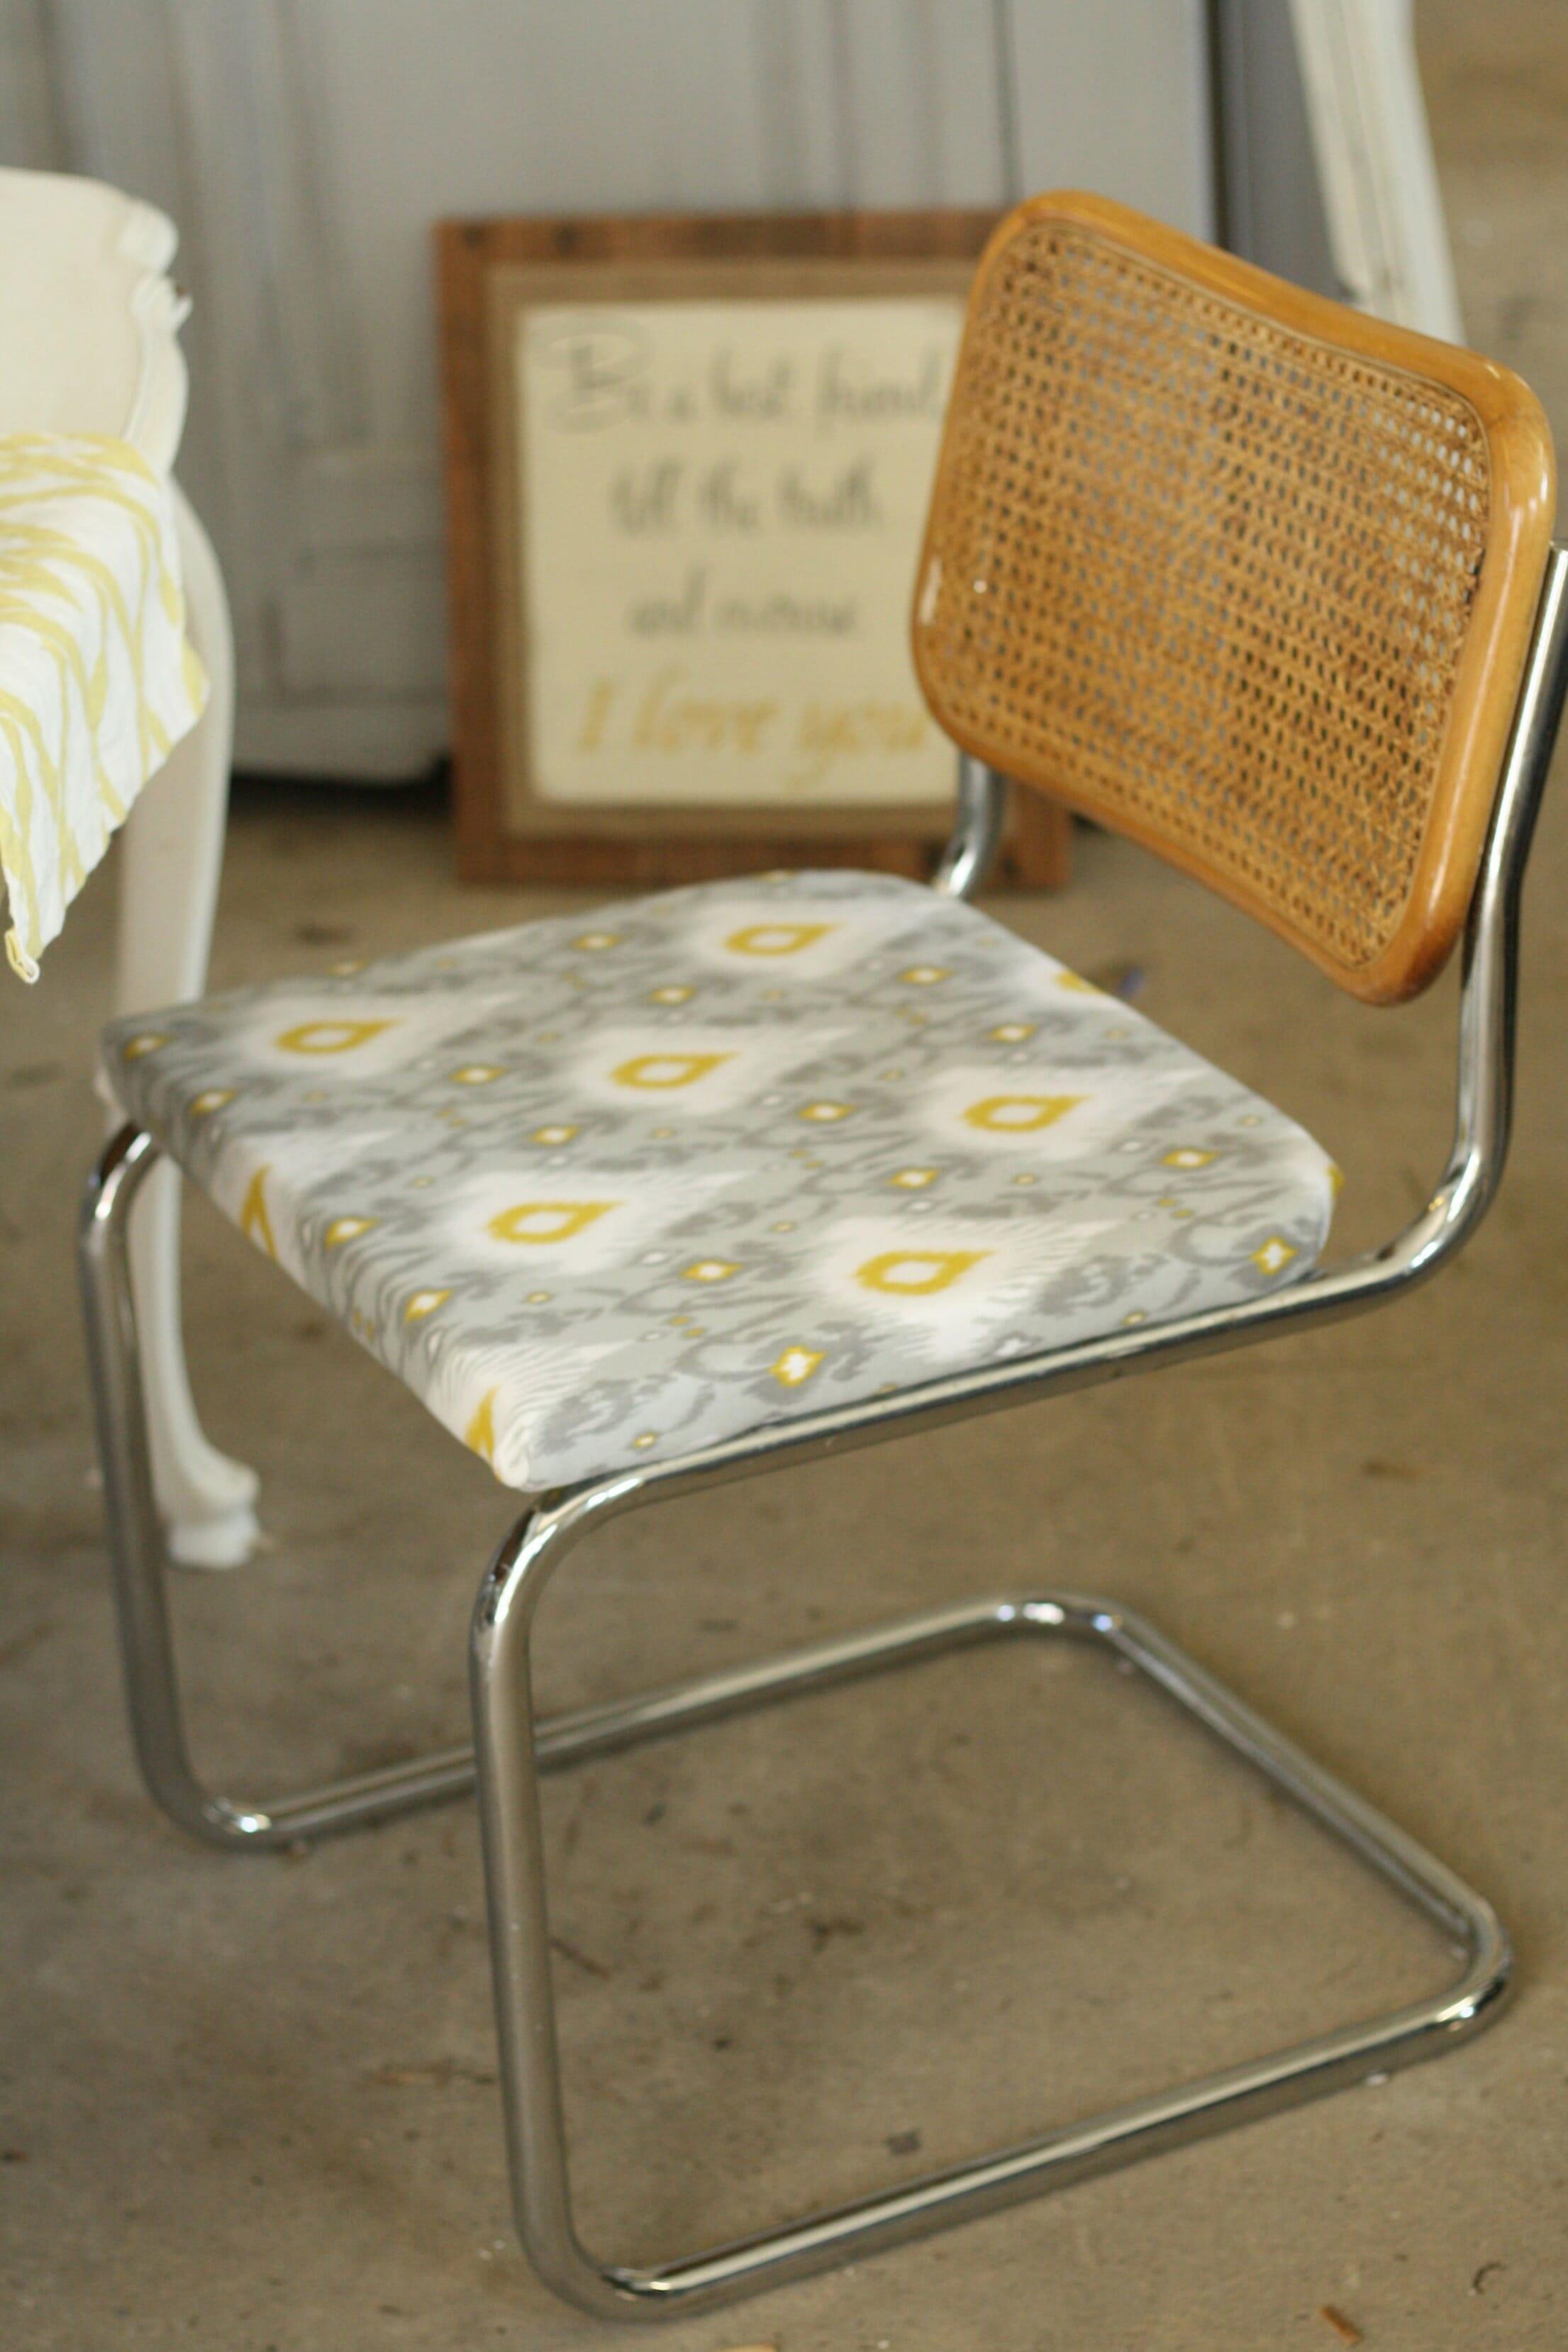 Breuer chairs new seats